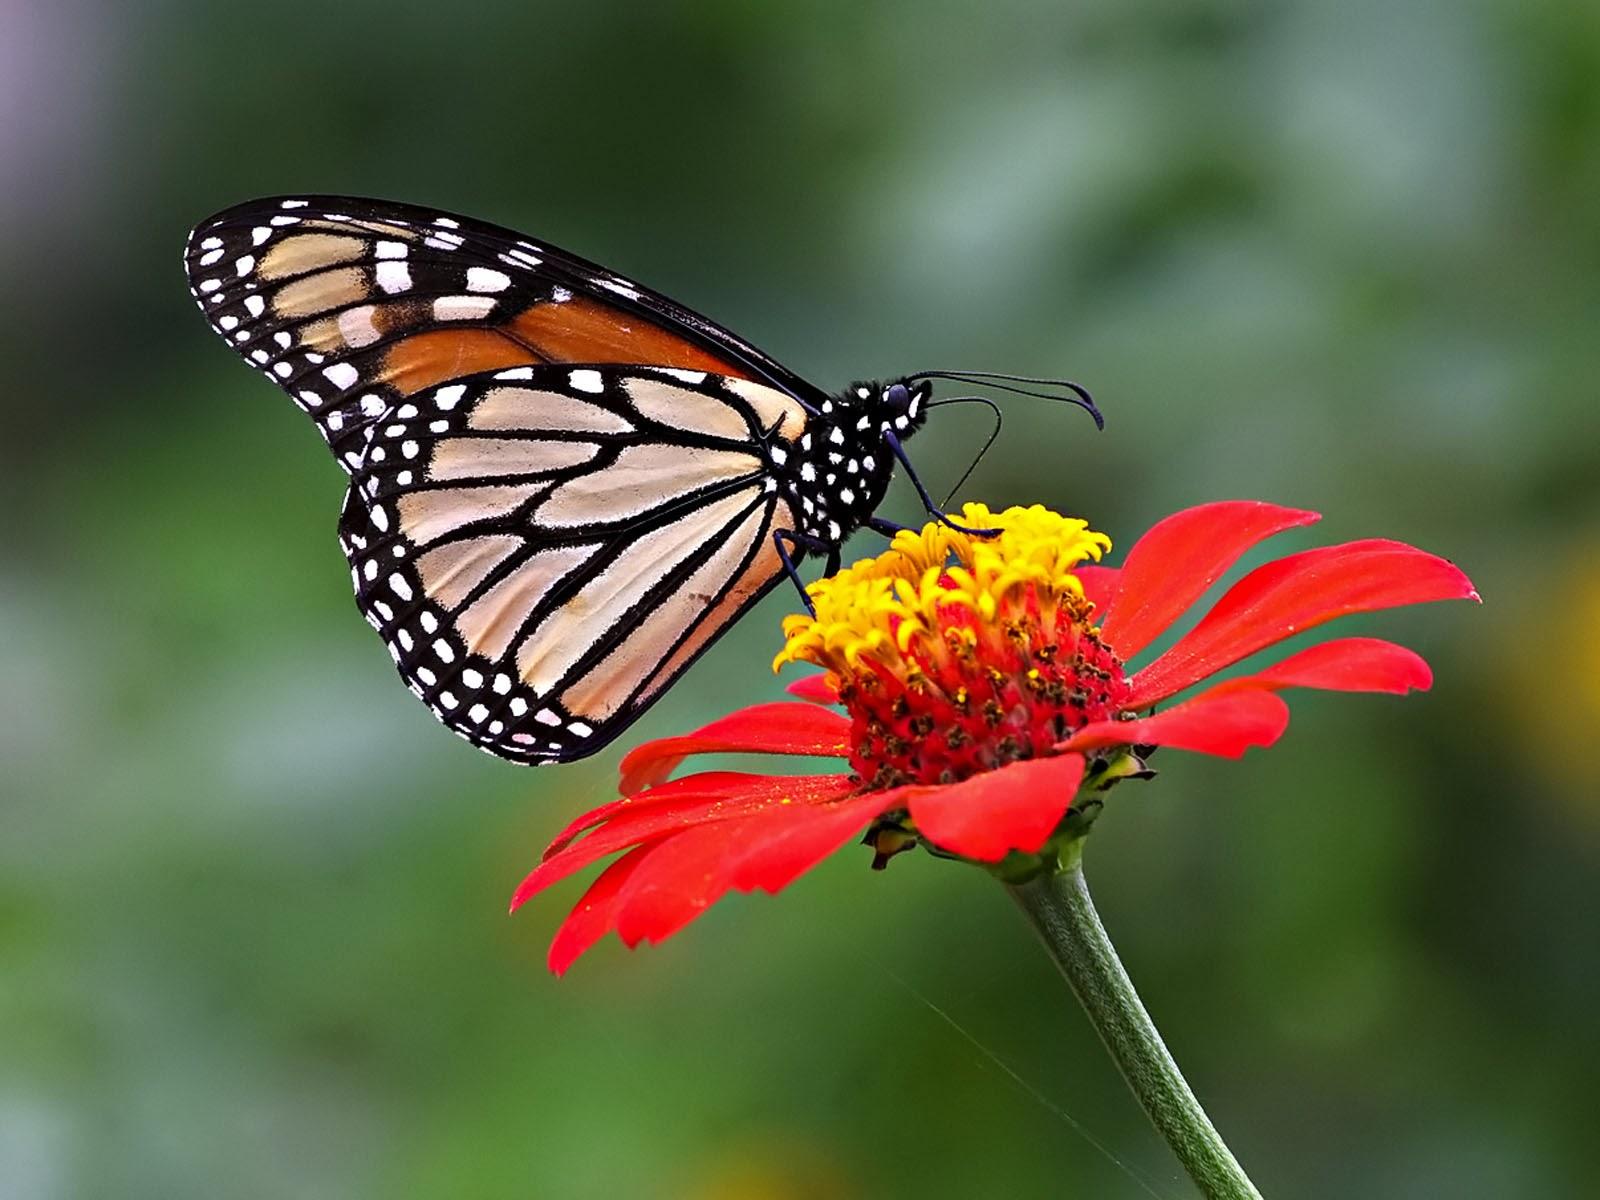 wallpapers: Butterfly Desktop Backgrounds